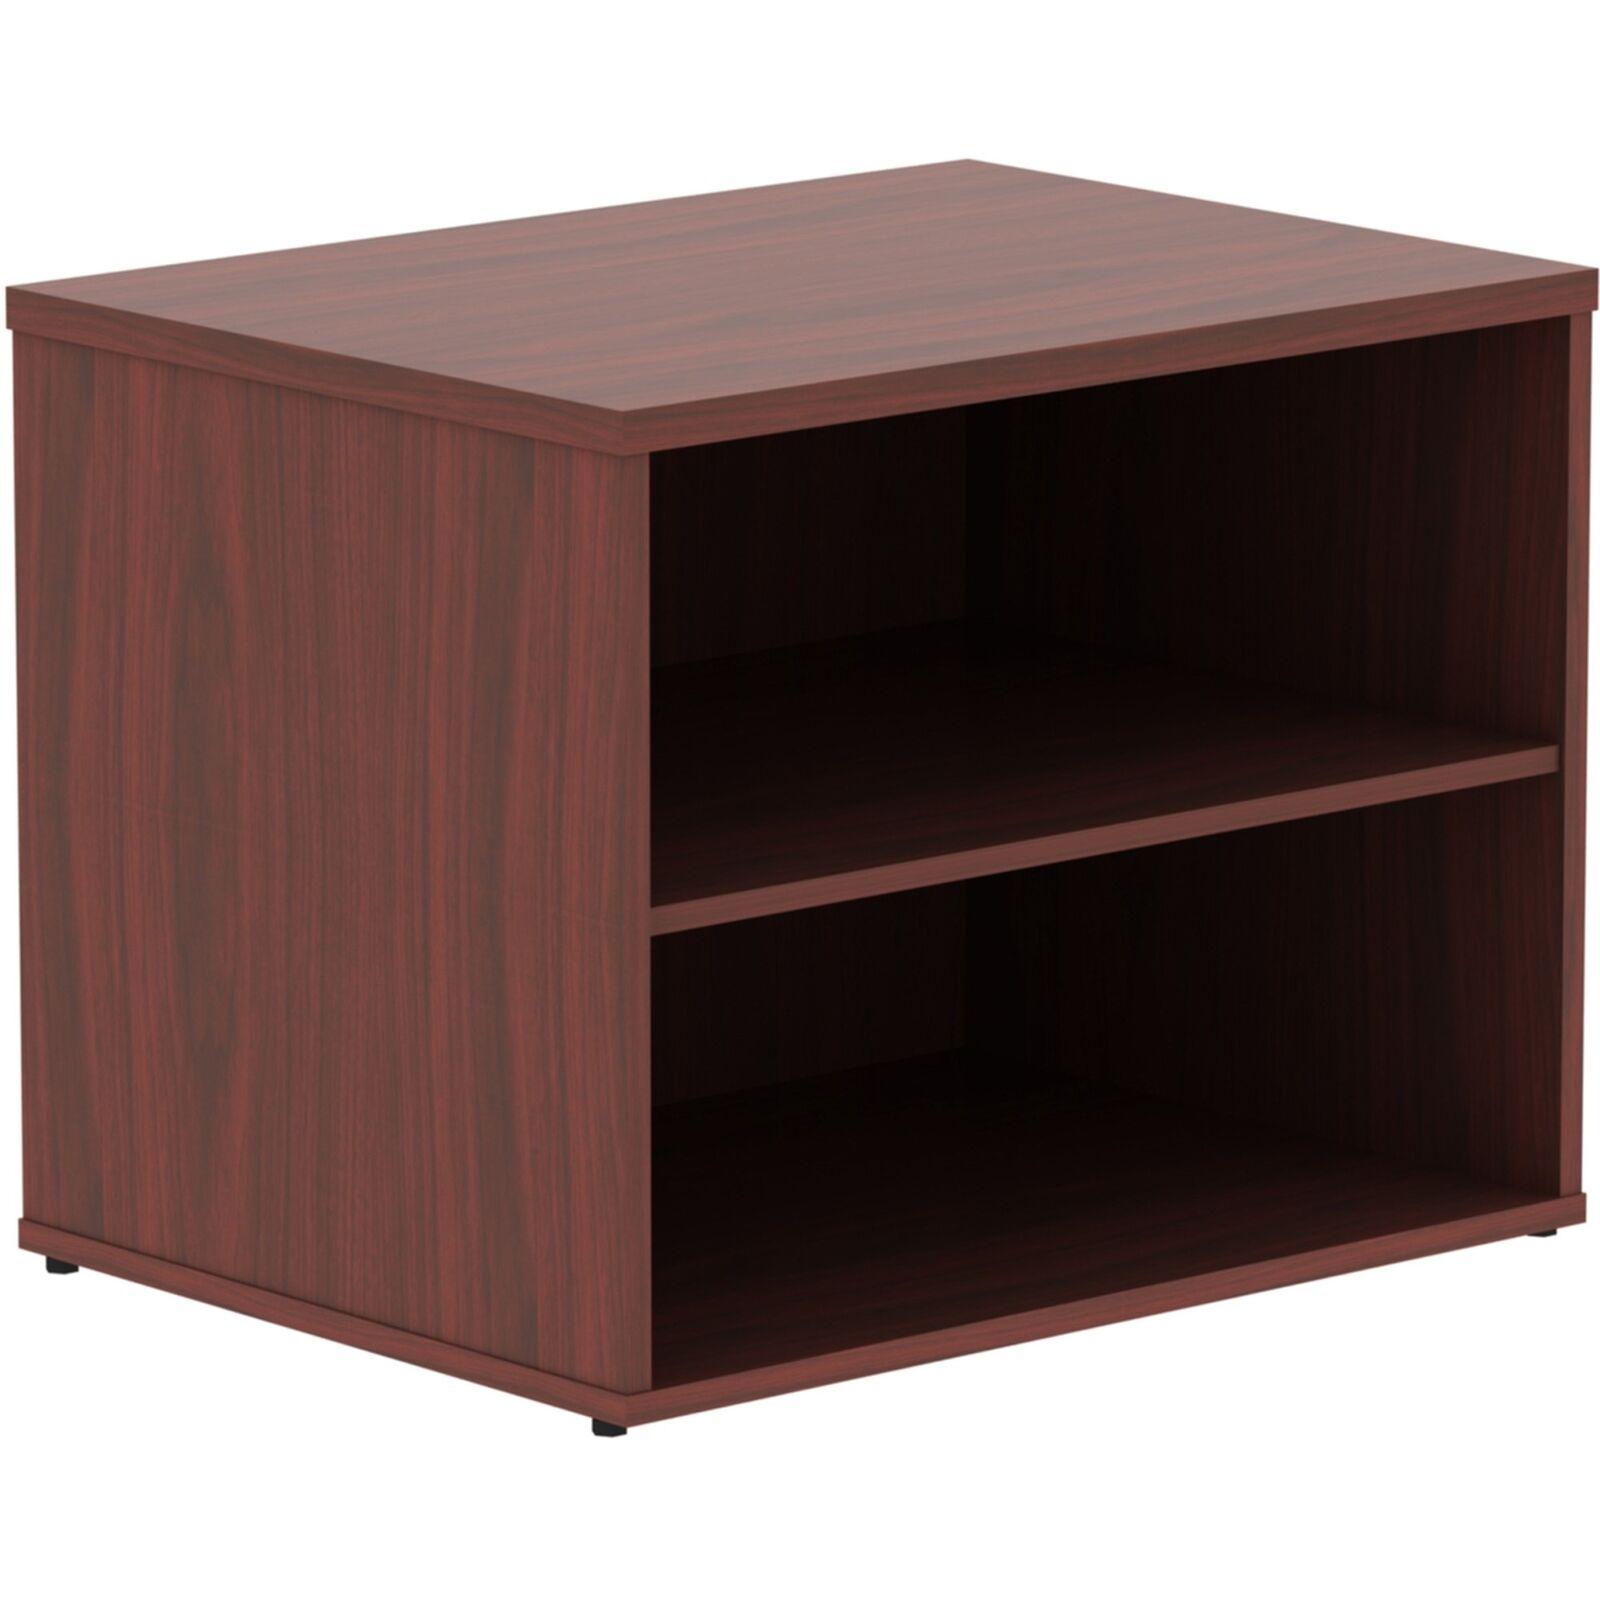 Lorell Relevance Series Mahogany Laminate Office Furniture (llr-16214)